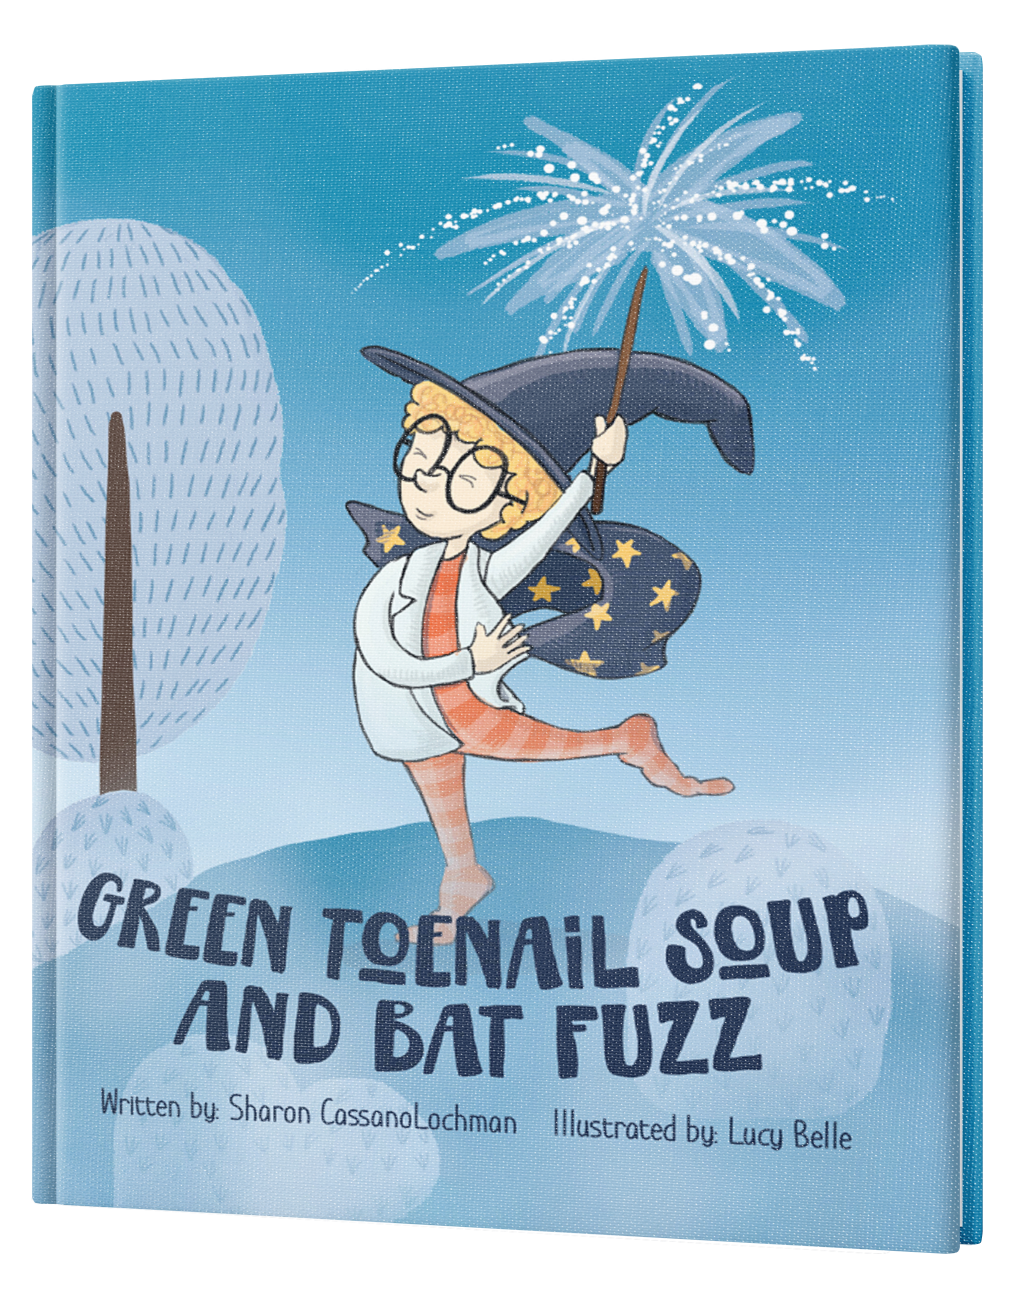 Green Toenail Soup and Bat Fuzz